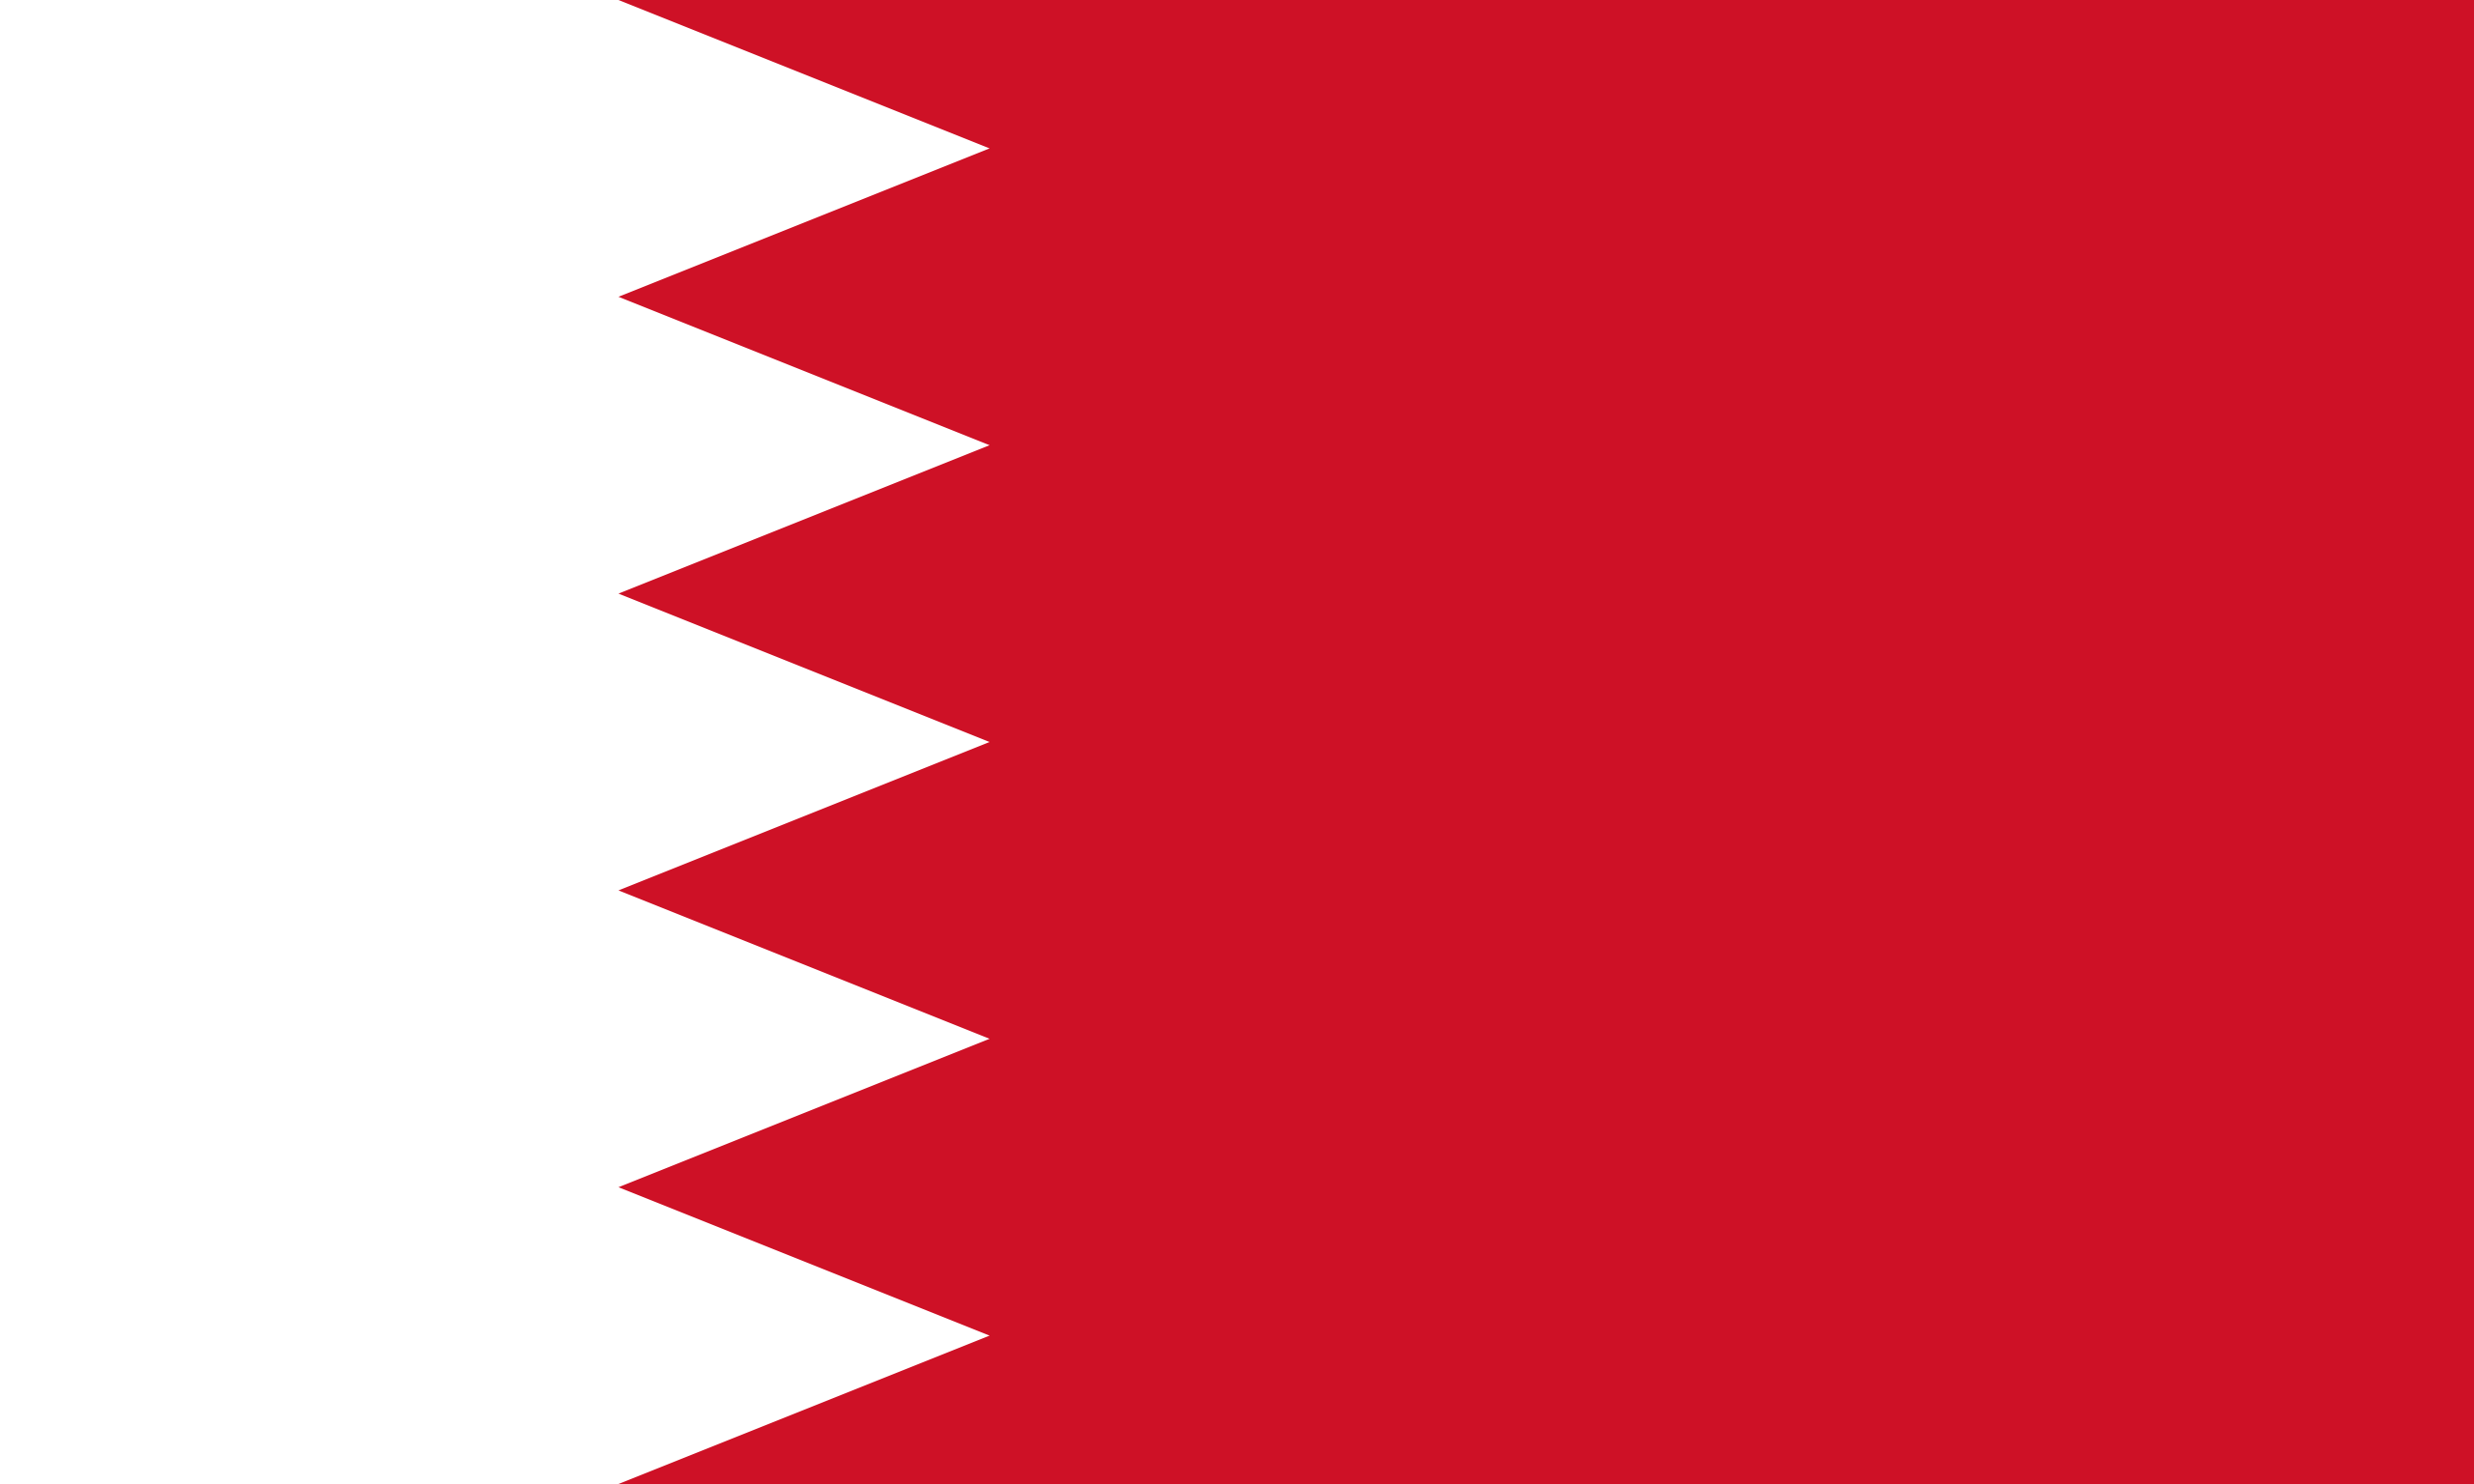 bahréin, 国家, 会徽, 徽标, 符号 - 高清壁纸 - 教授-falken.com